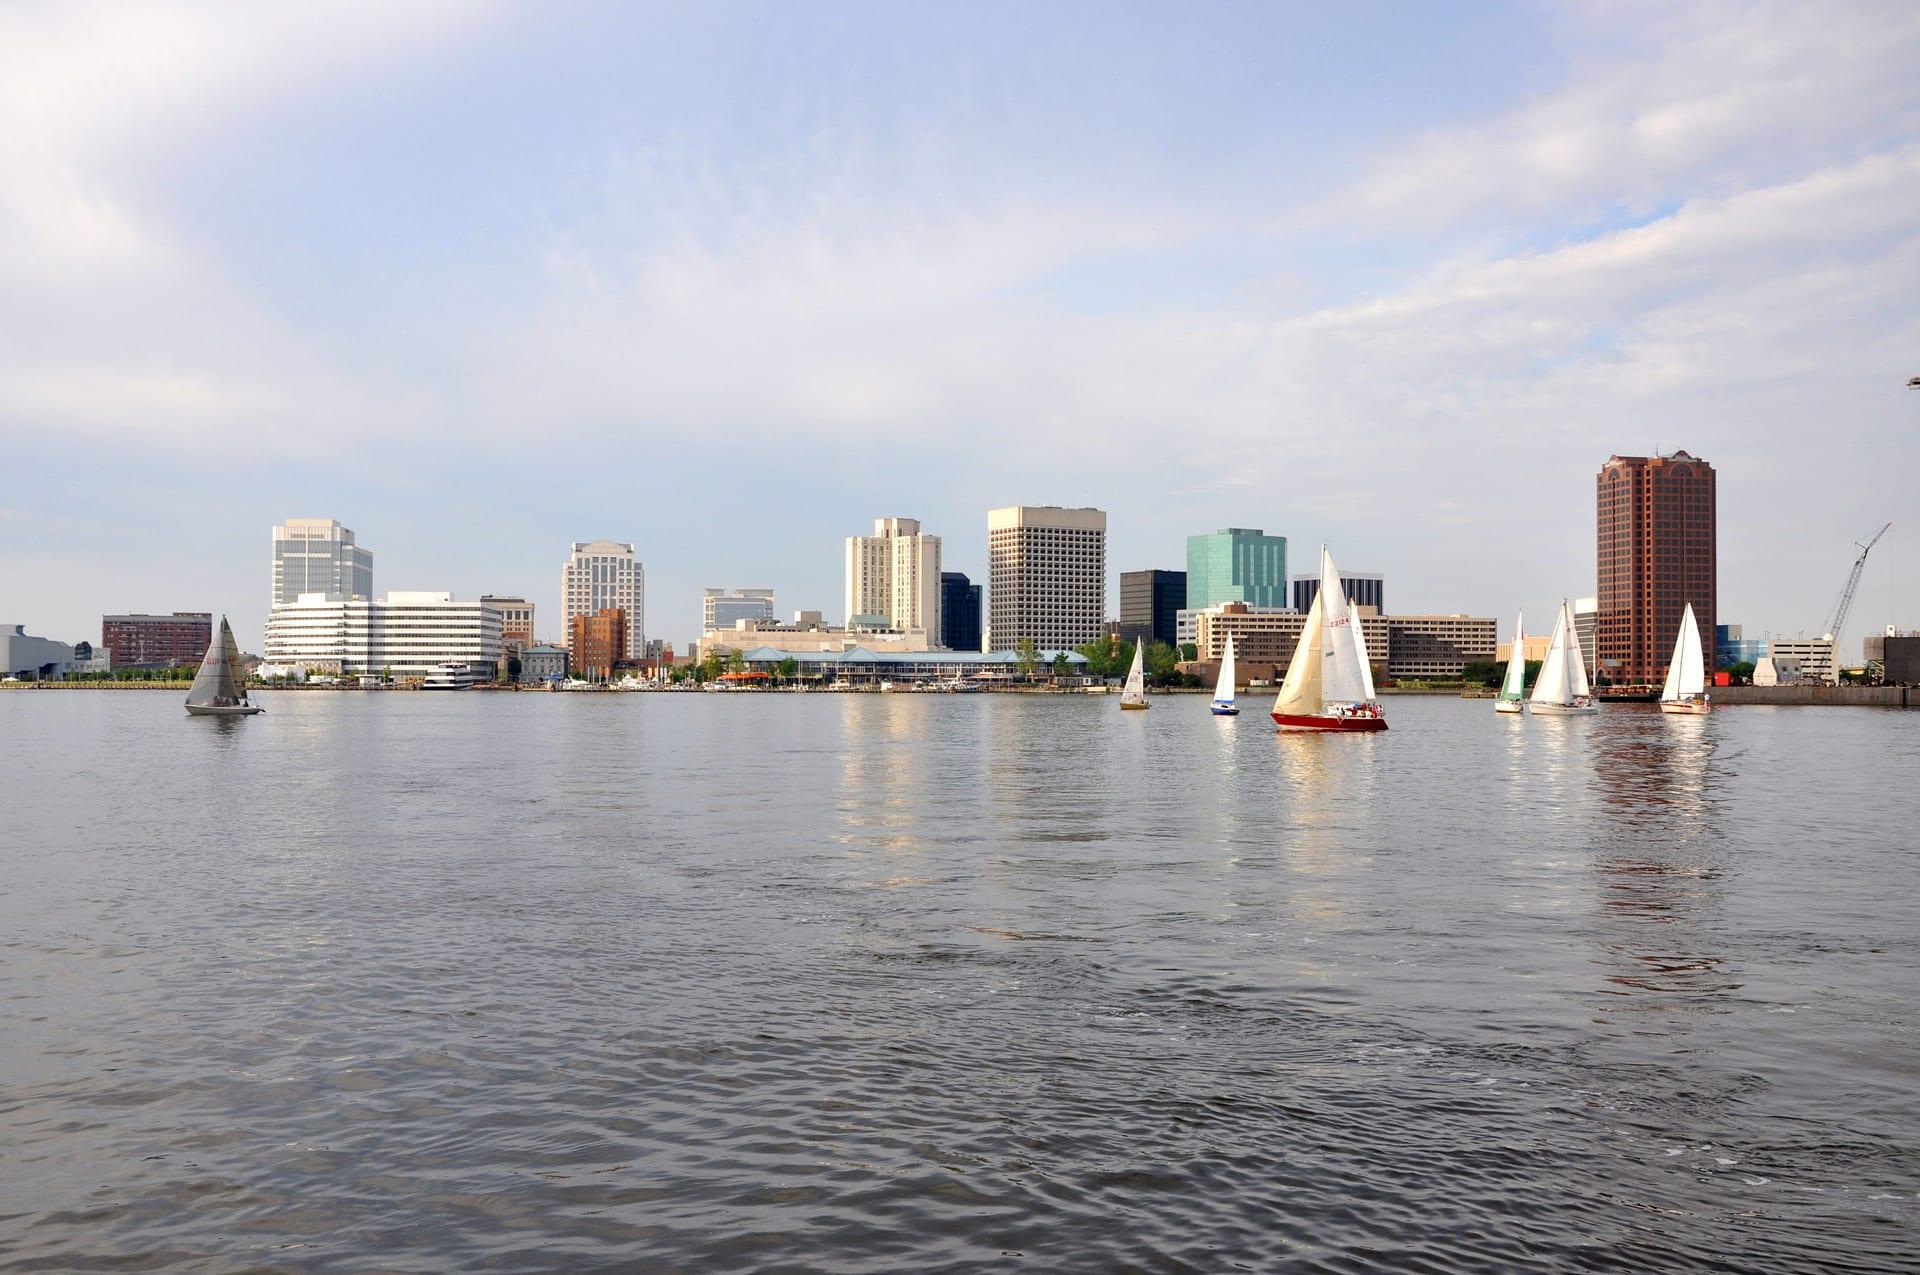 Norfolk city skyline and Elizabeth River, Virginia, USA